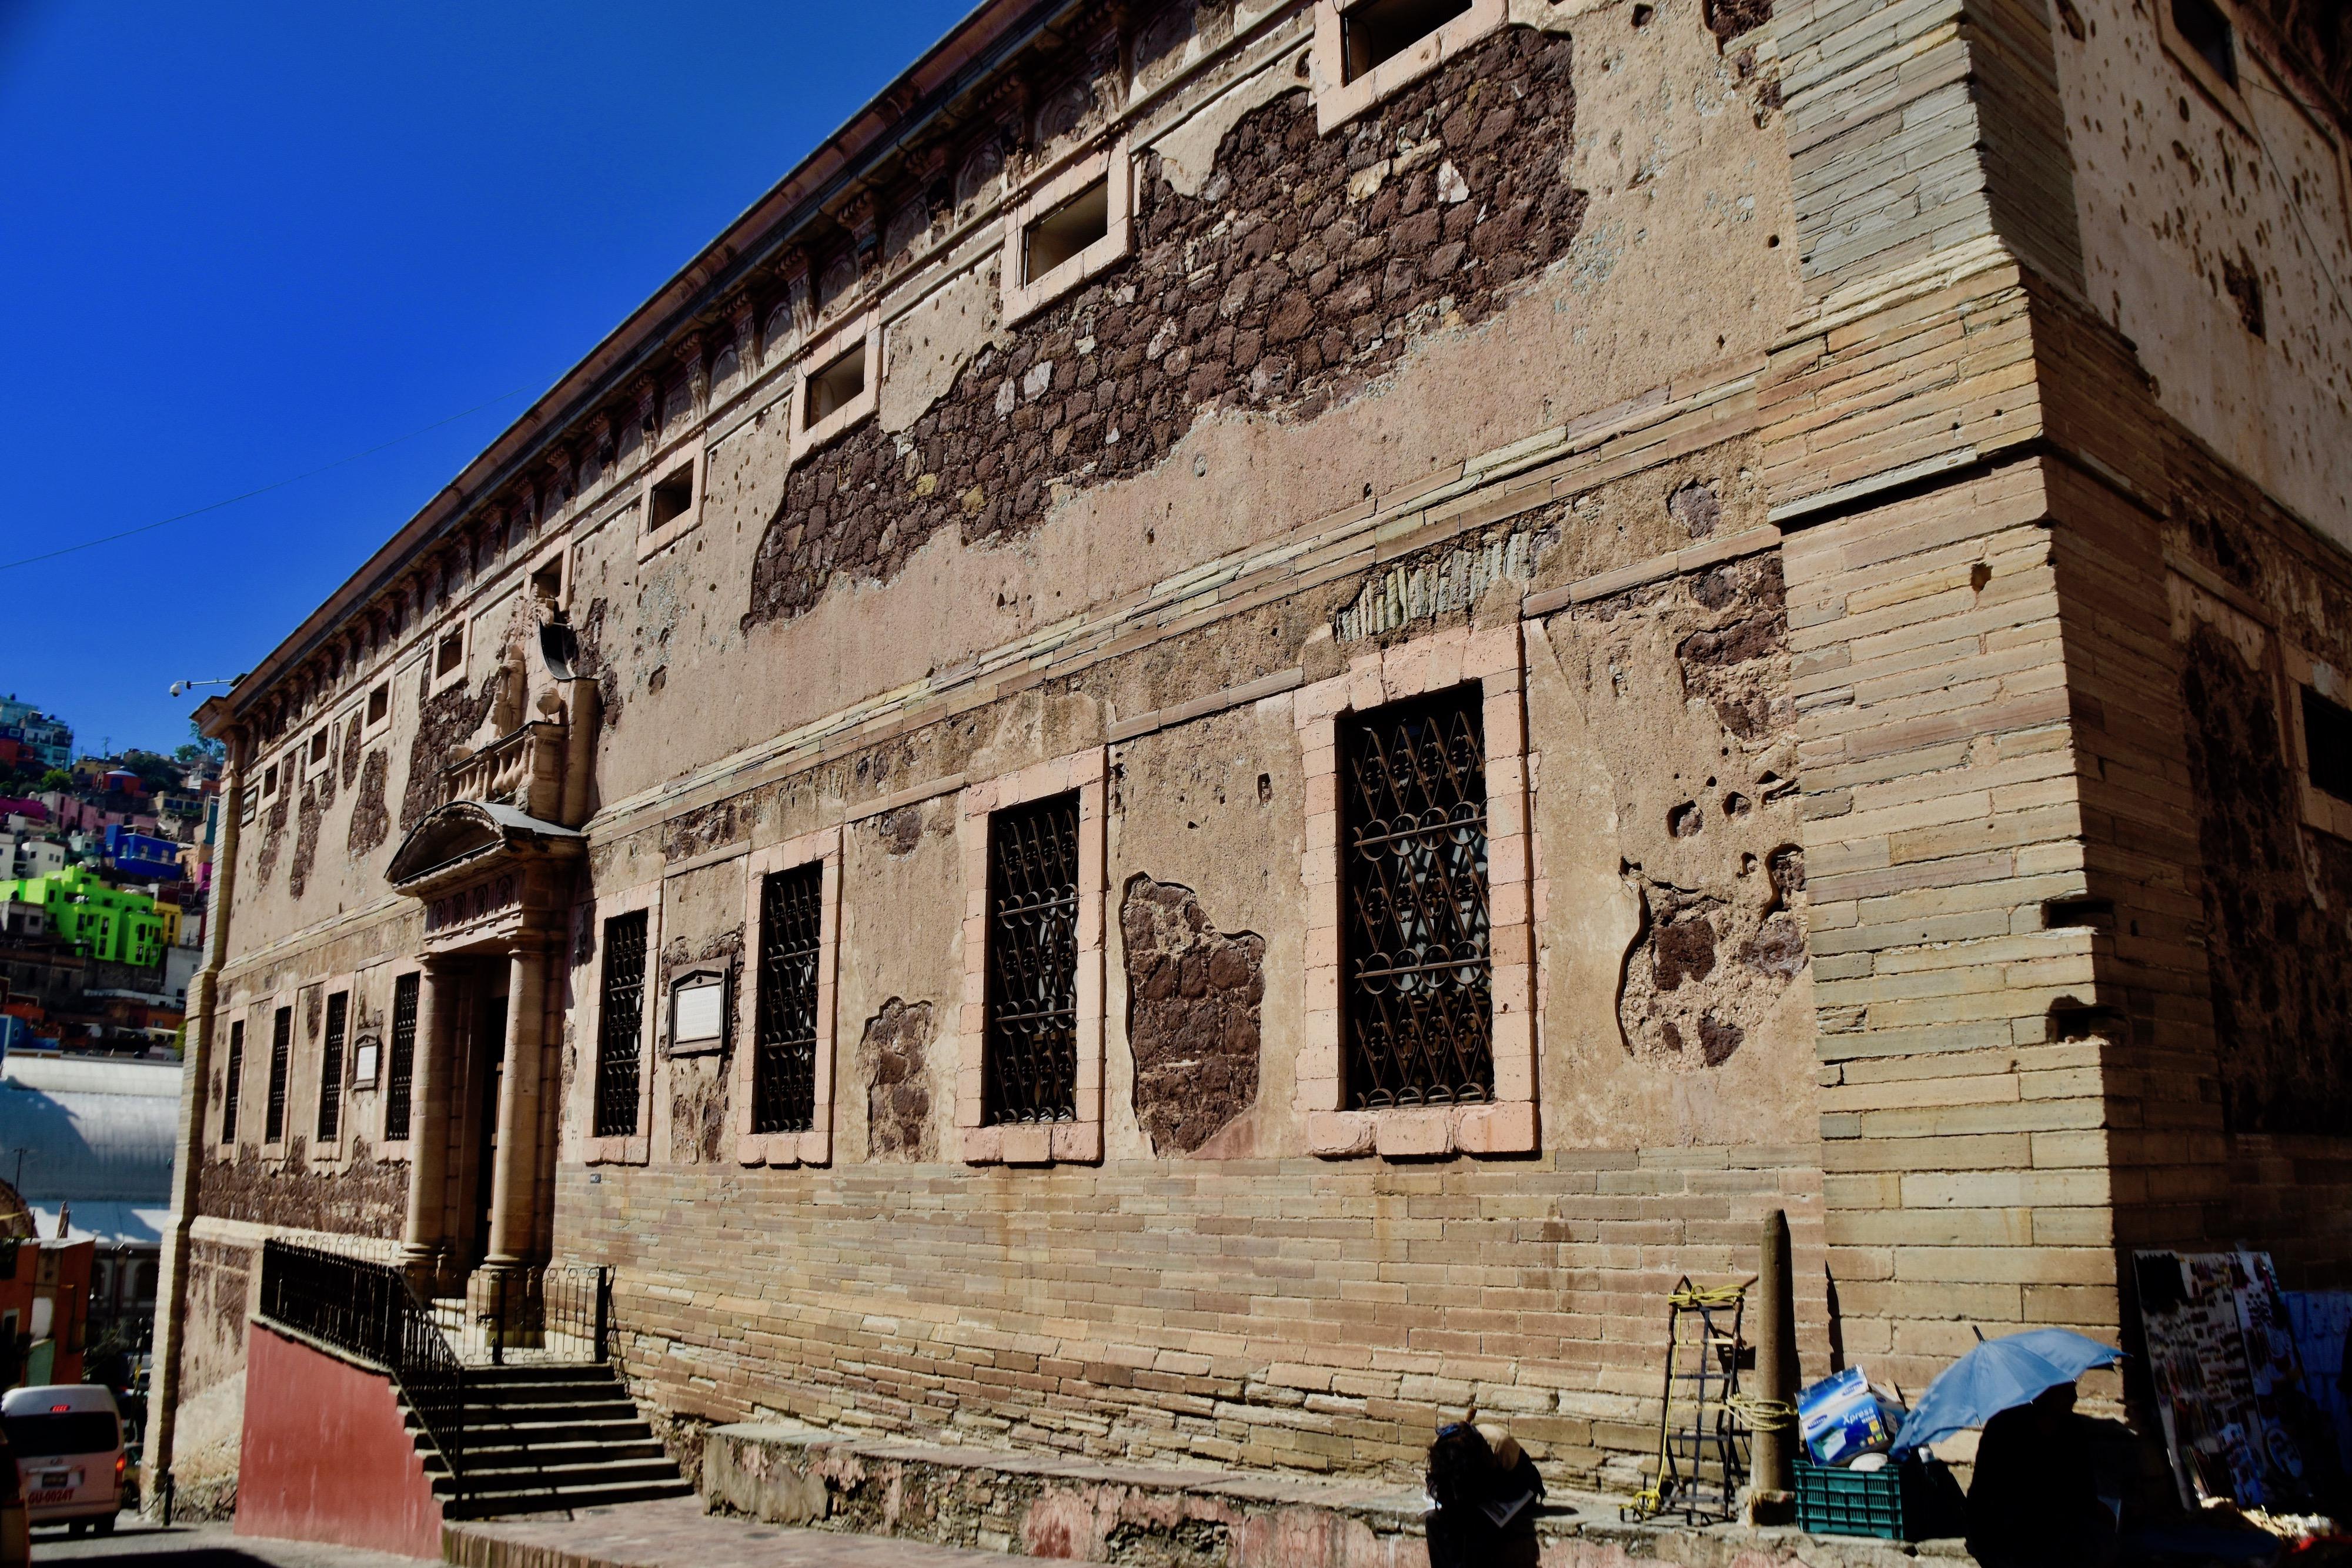 Alhondigas de Granaditas, Guanajuato